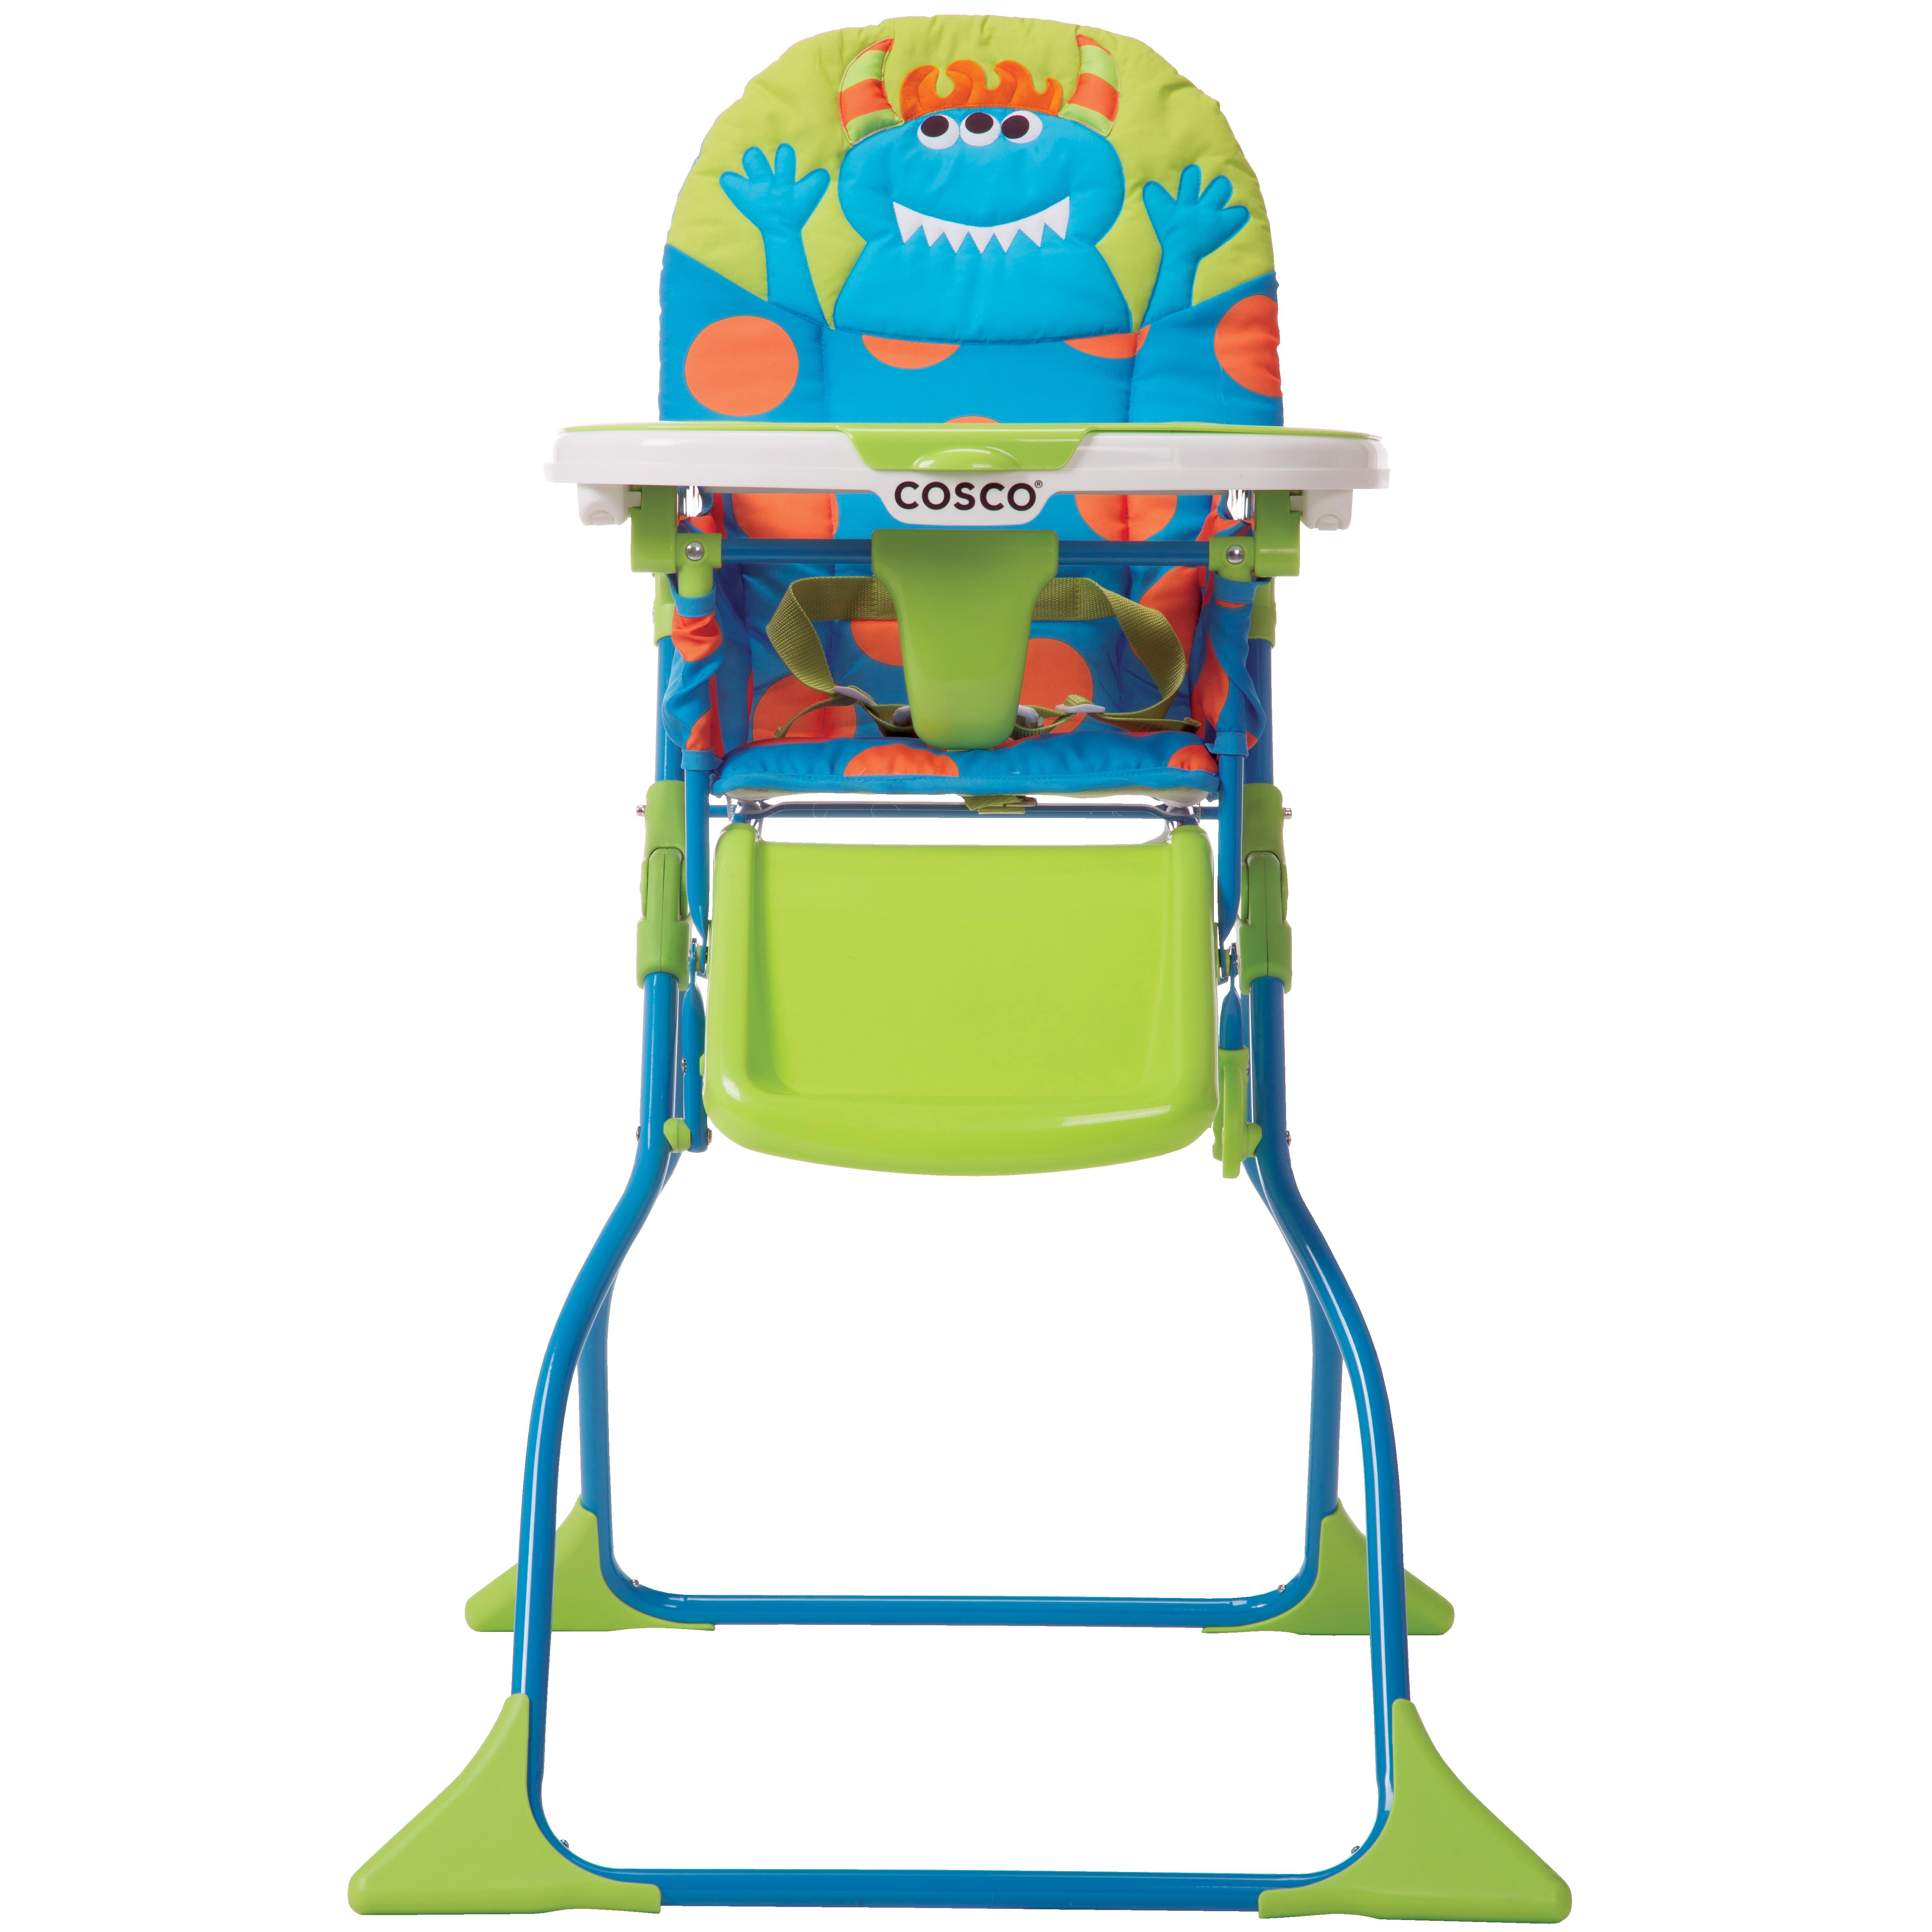 5013x5014 Minnie Mouse Potty Chair Walmart Creative Chair Decoration